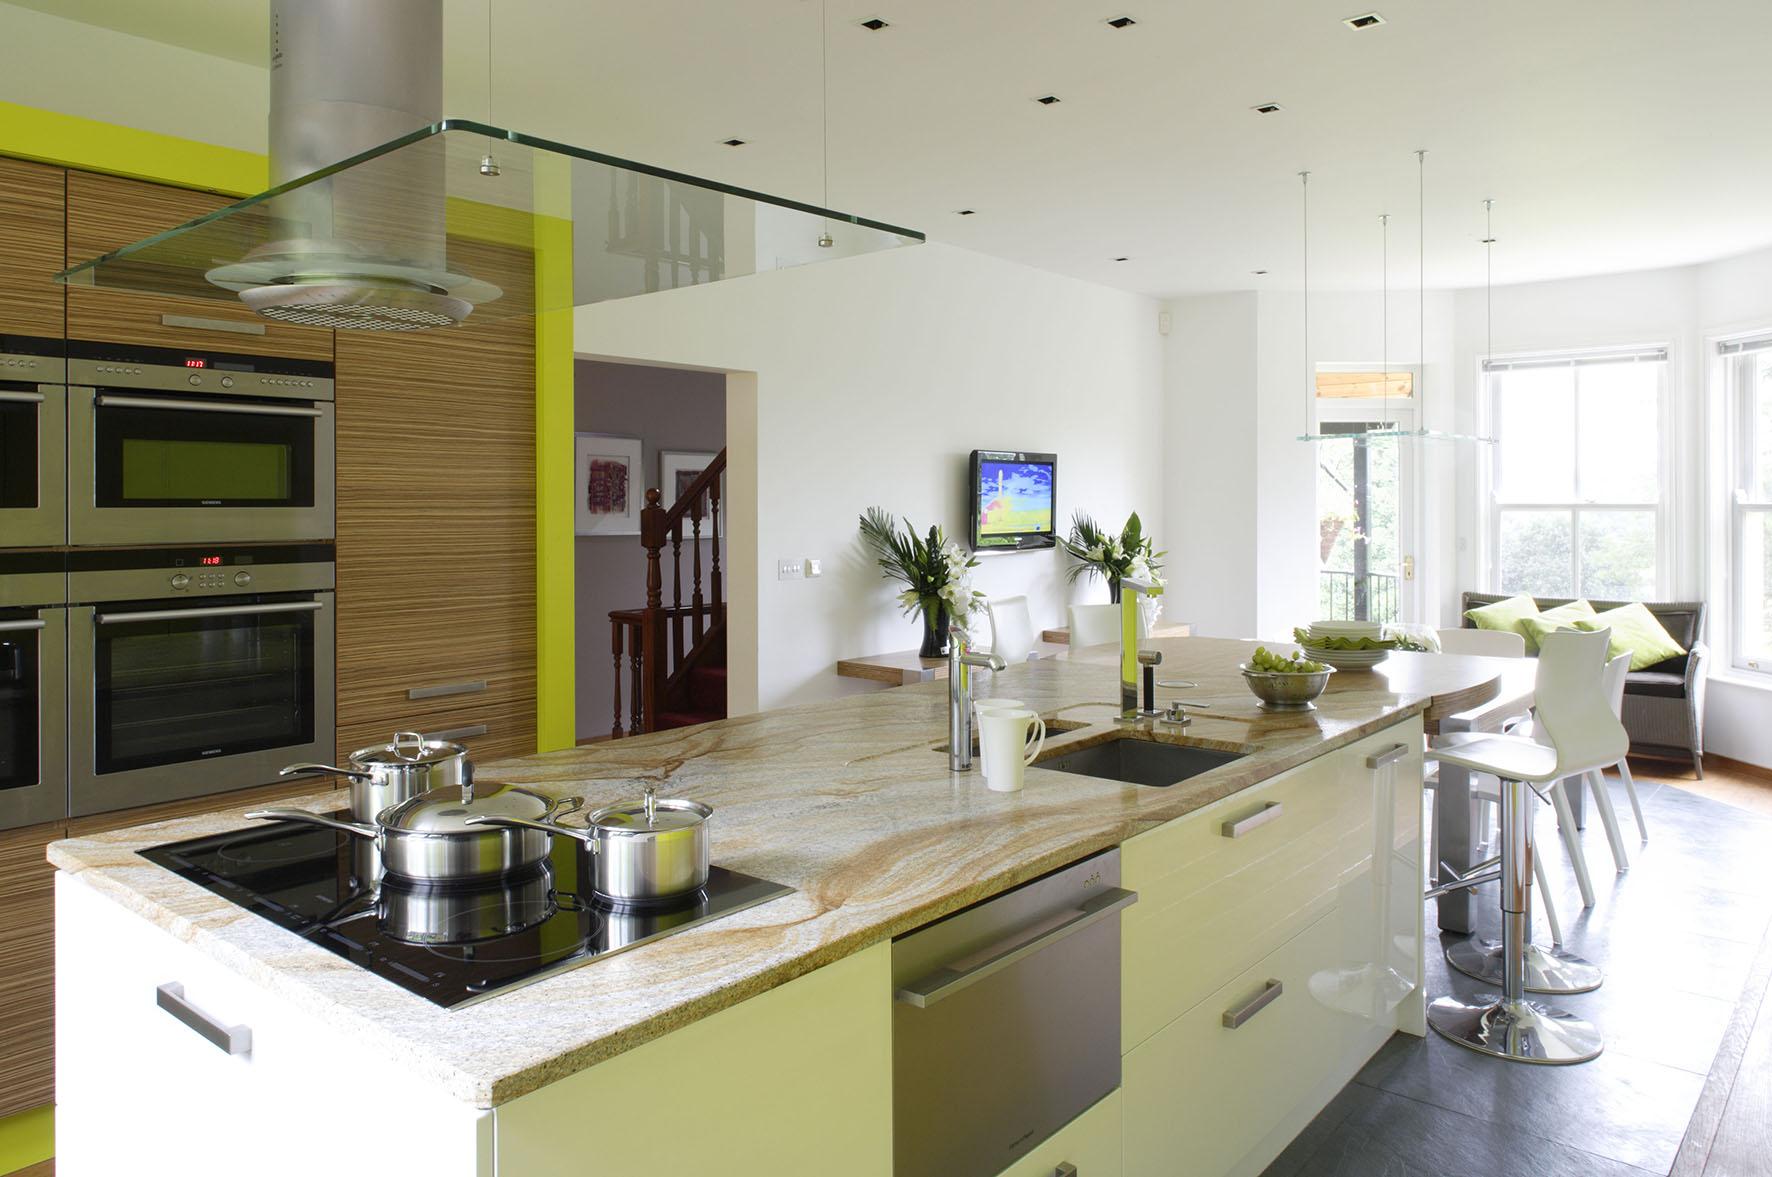 Kitchenaid Bowls For Stand Mixer Kitchen Ideas